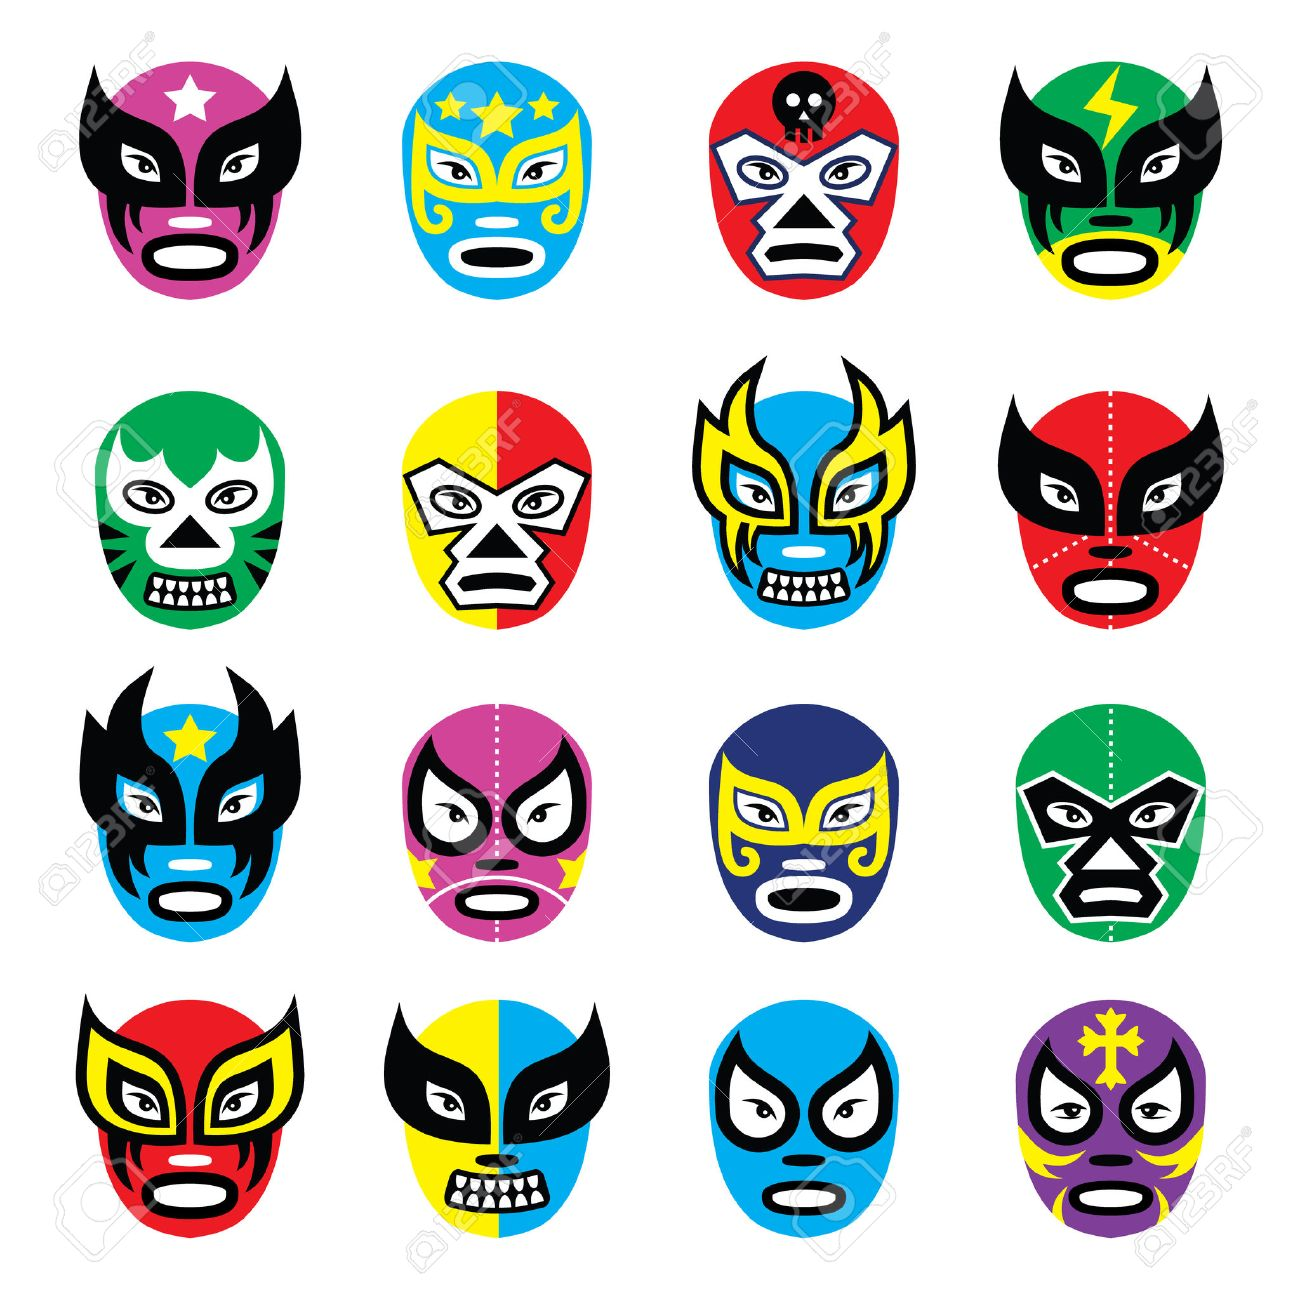 Lucha libre, luchador mexican wrestling masks icons Foto de archivo - 26590831